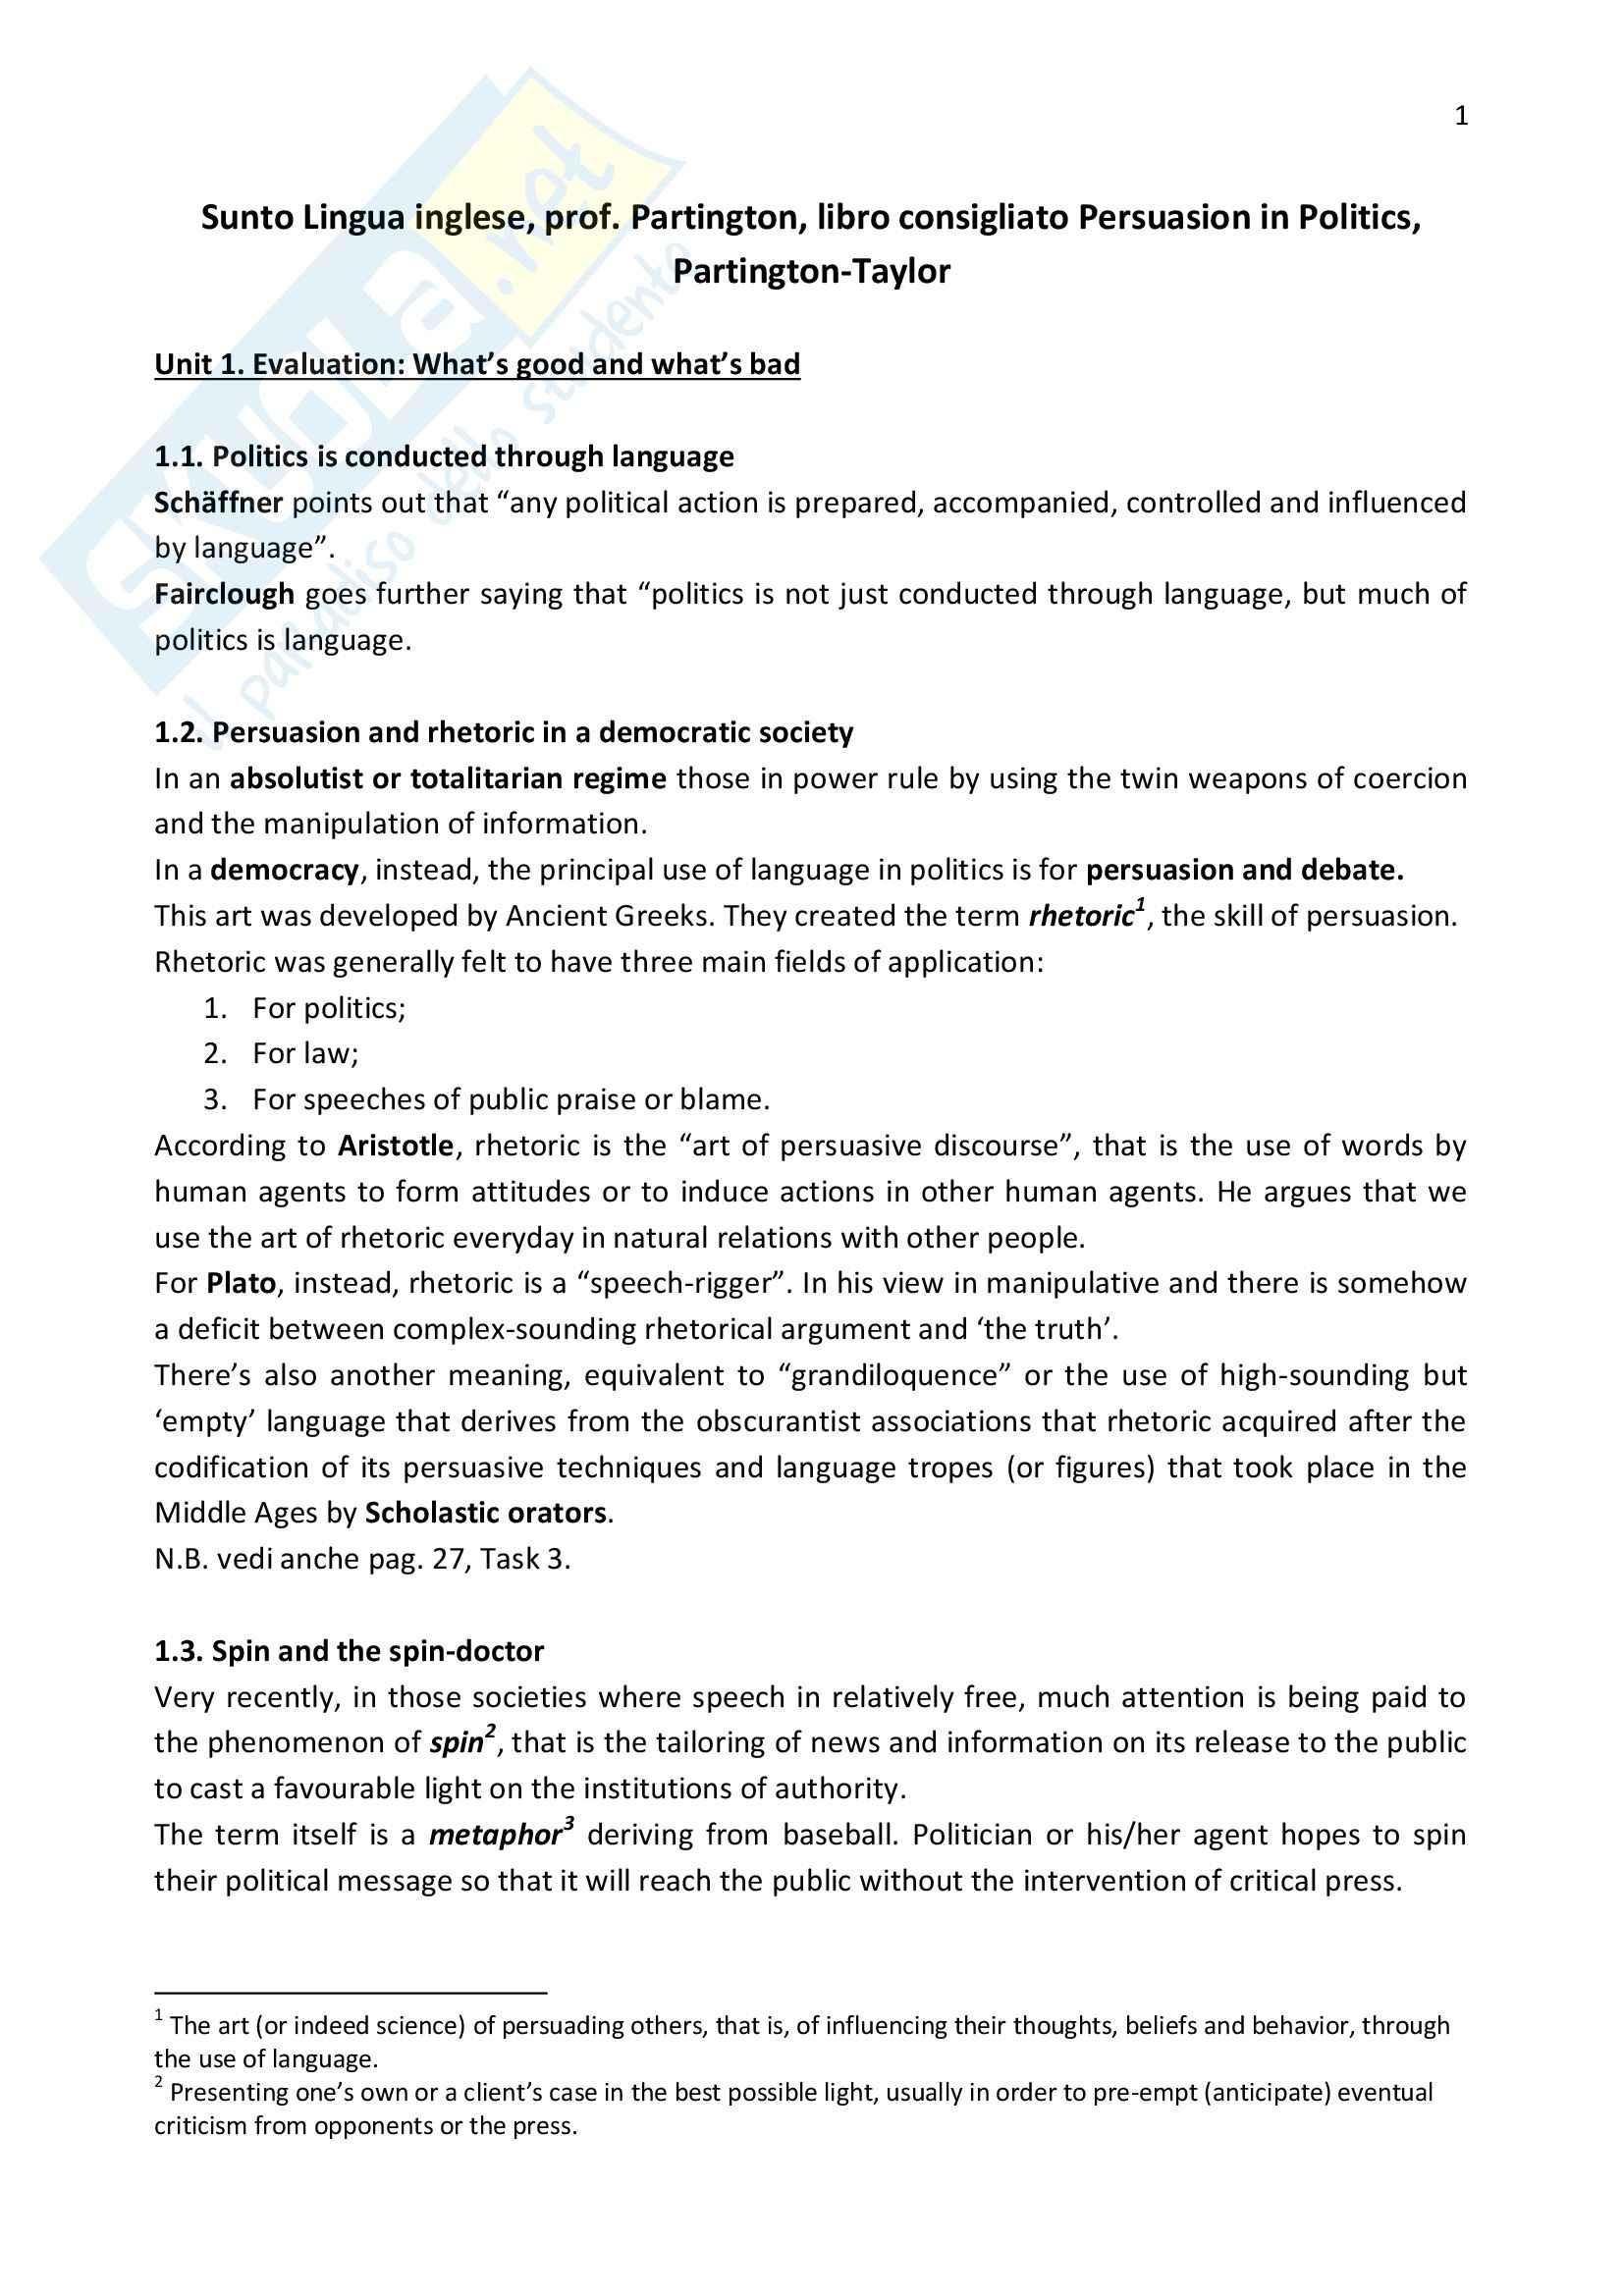 Riassunto esame Lingua inglese, prof. Partington, libro consigliato Persuasion in Politics, Partington, Taylor